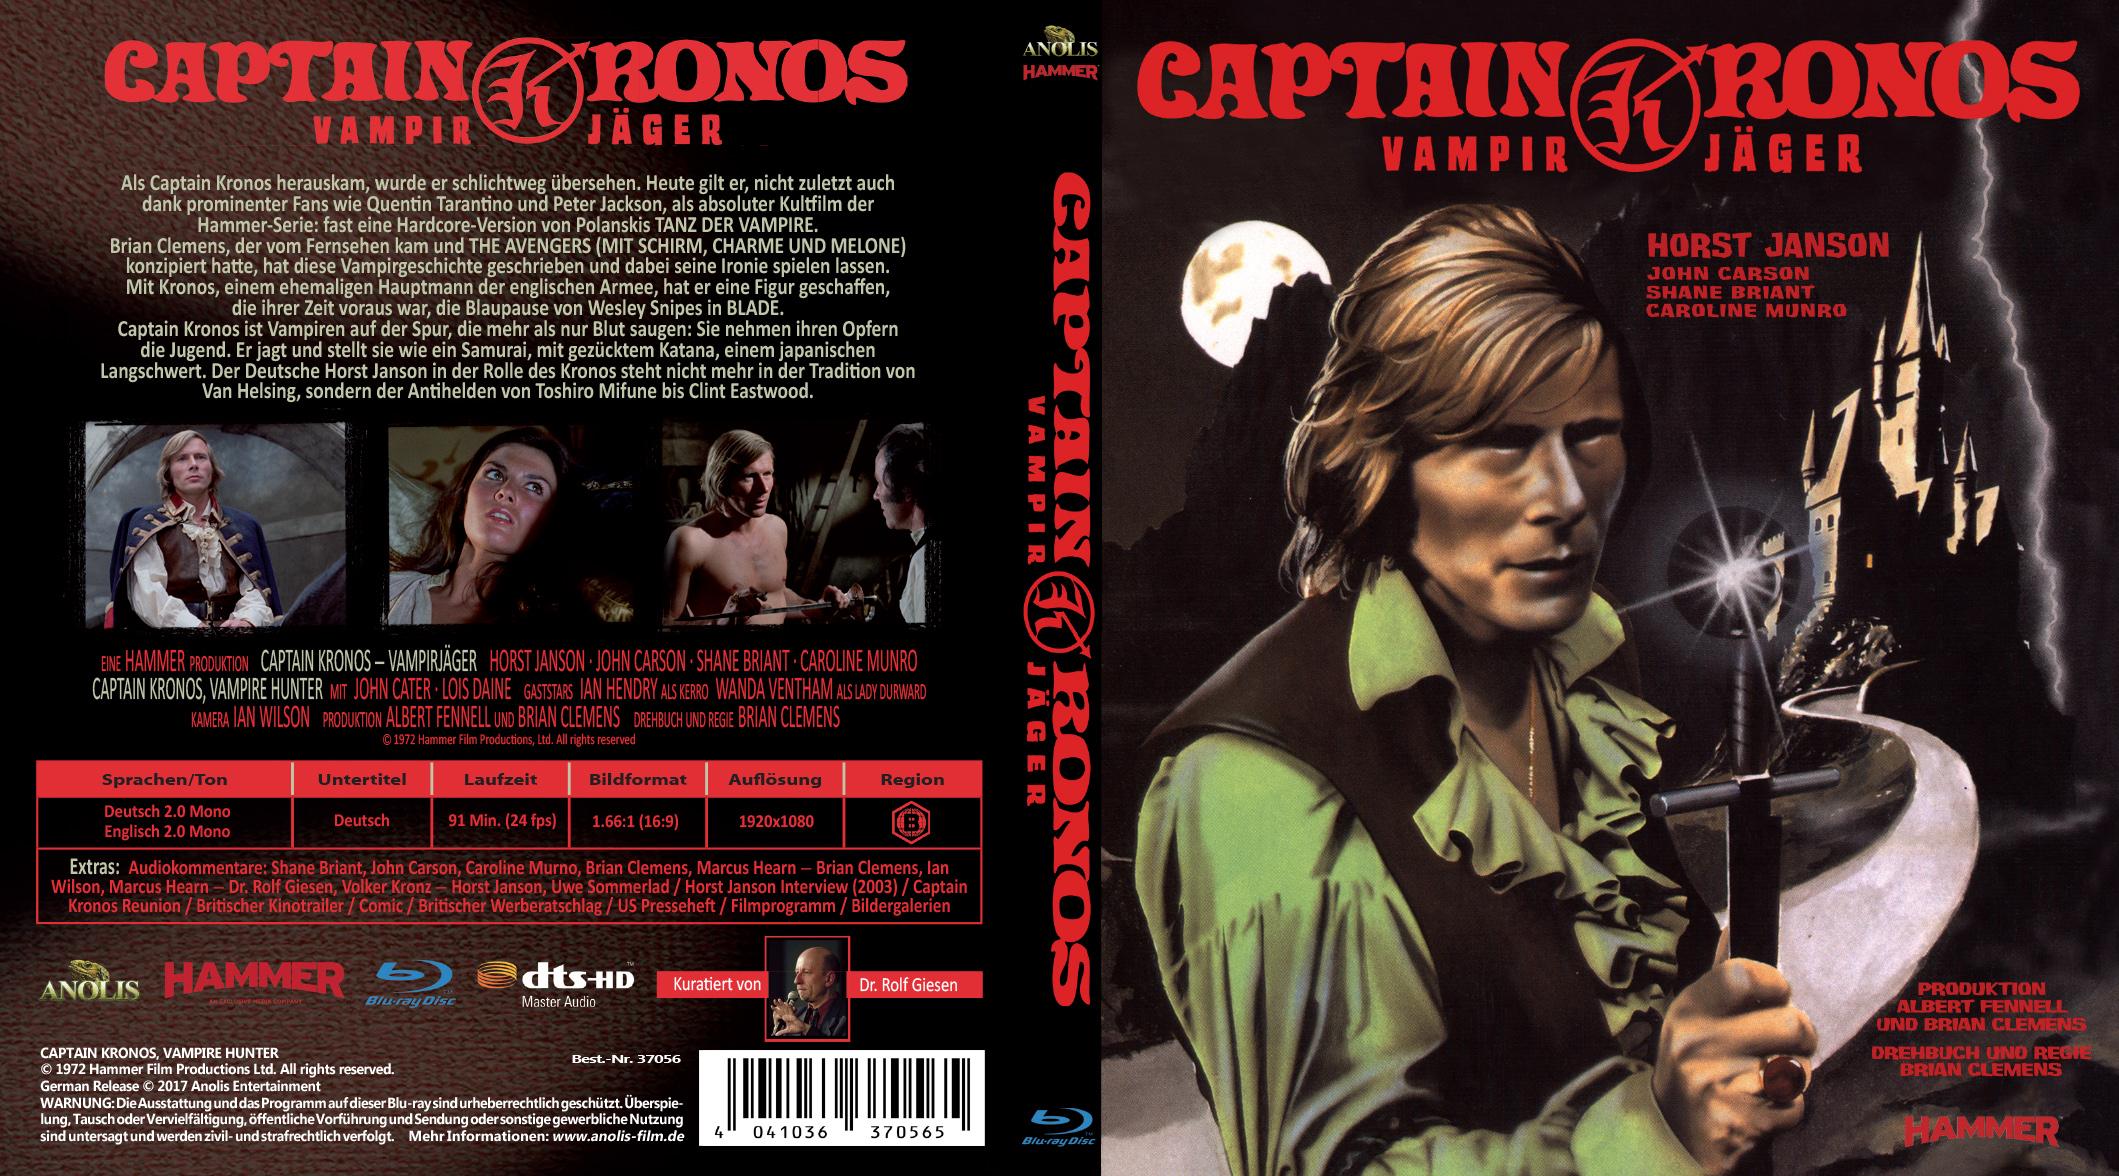 Hammer15_CaptainKronos (Softbox)